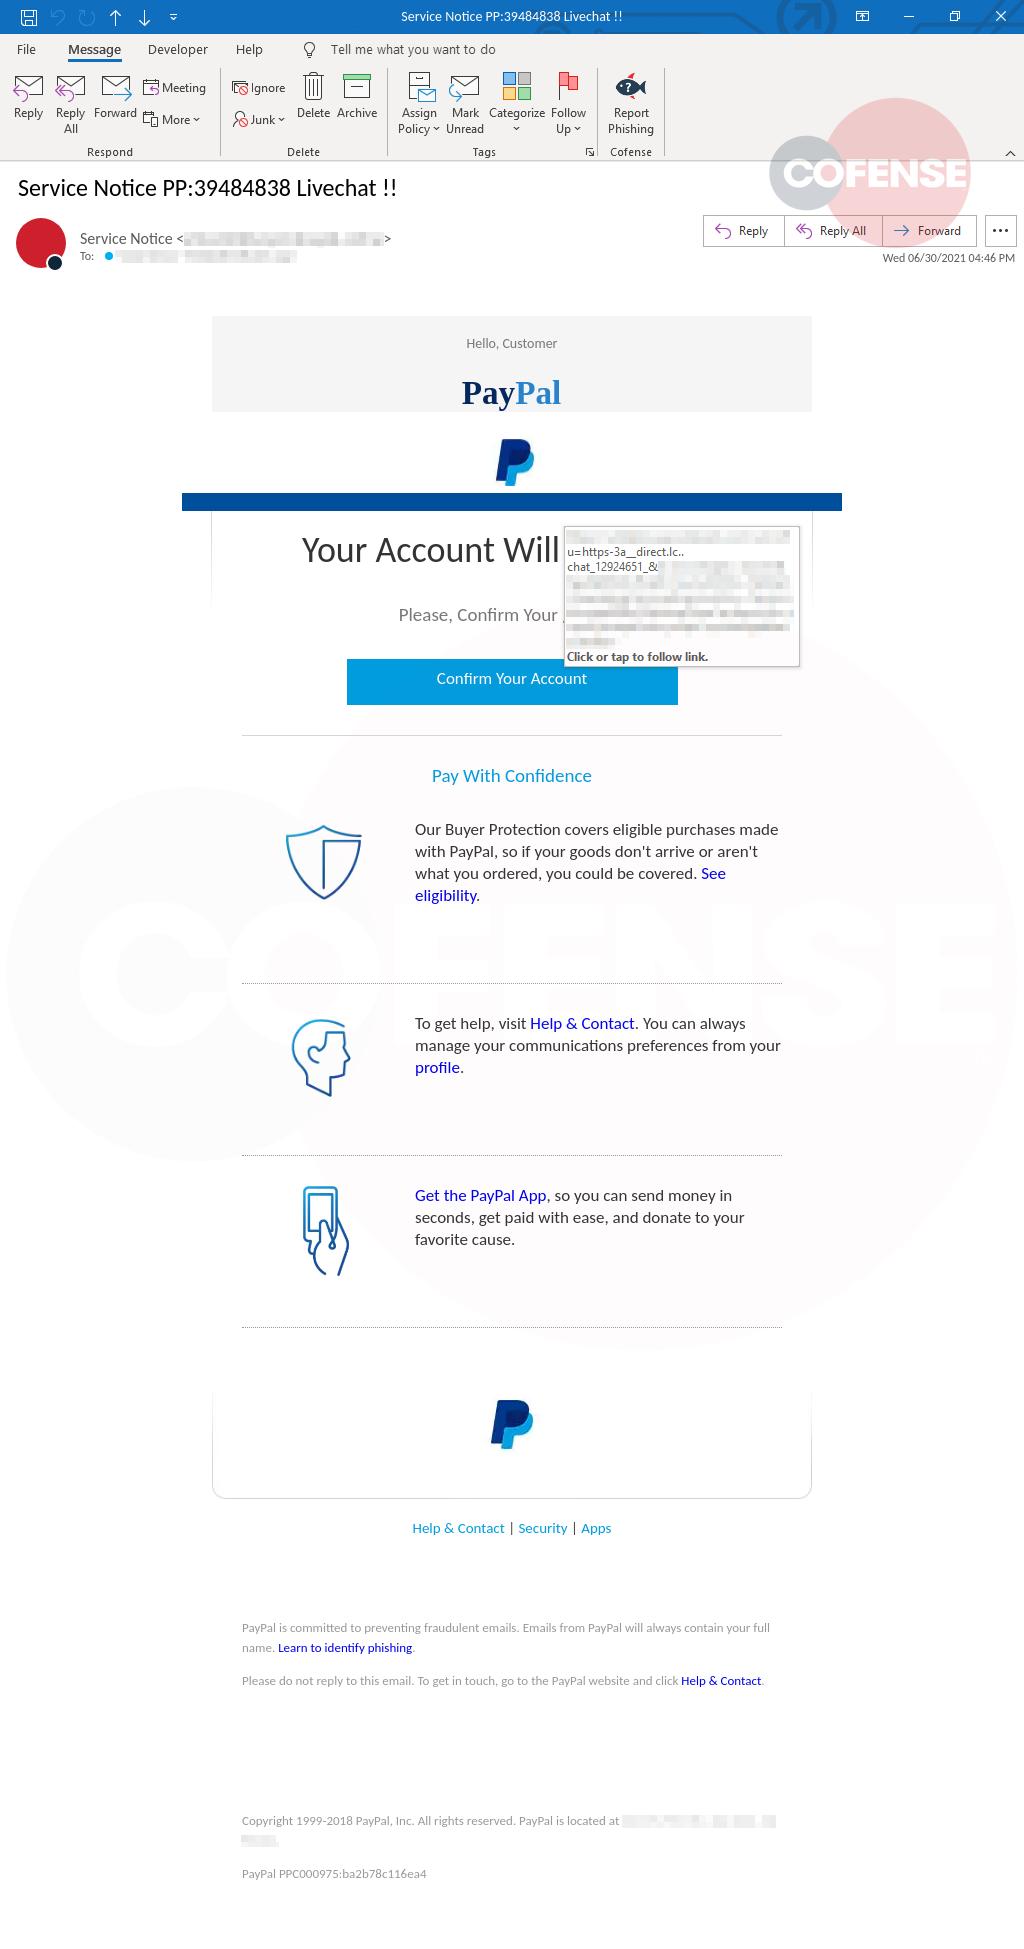 paypal phishing technique